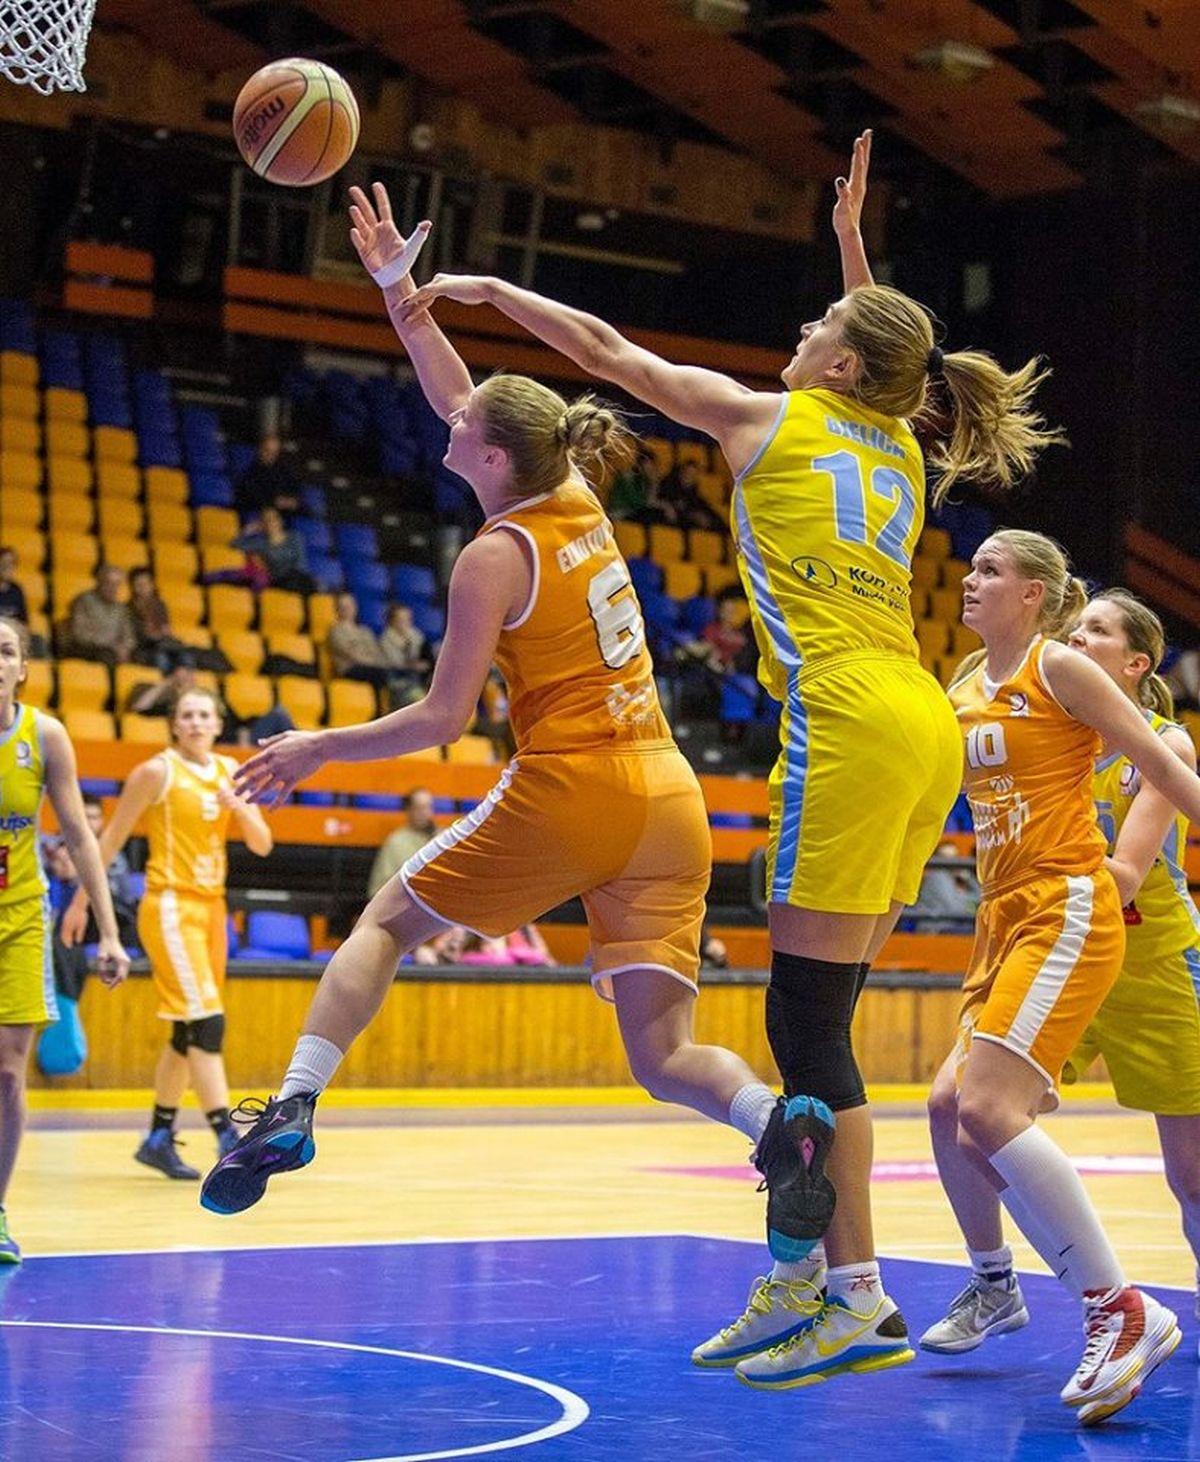 Ženský basketbal. Foto: TVCom.cz